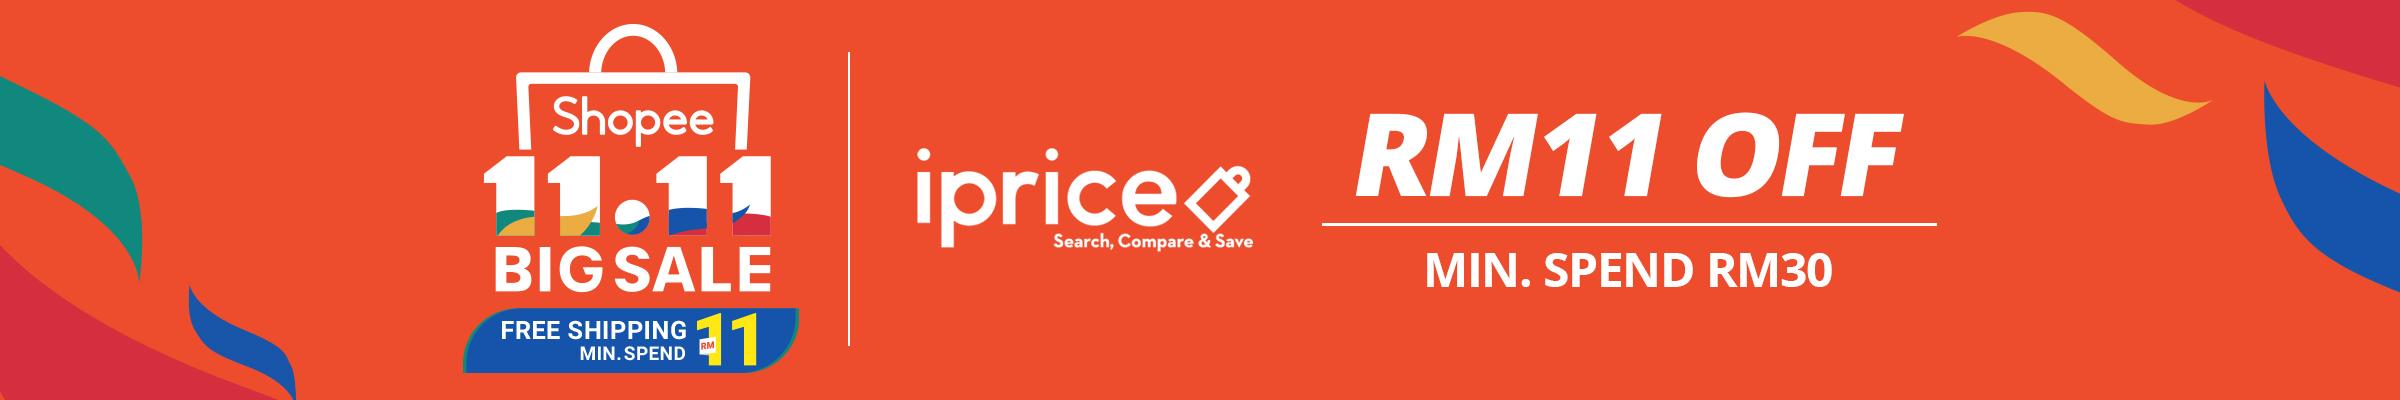 Shopee 11.11 Sale 24 Oct - 14 Nov